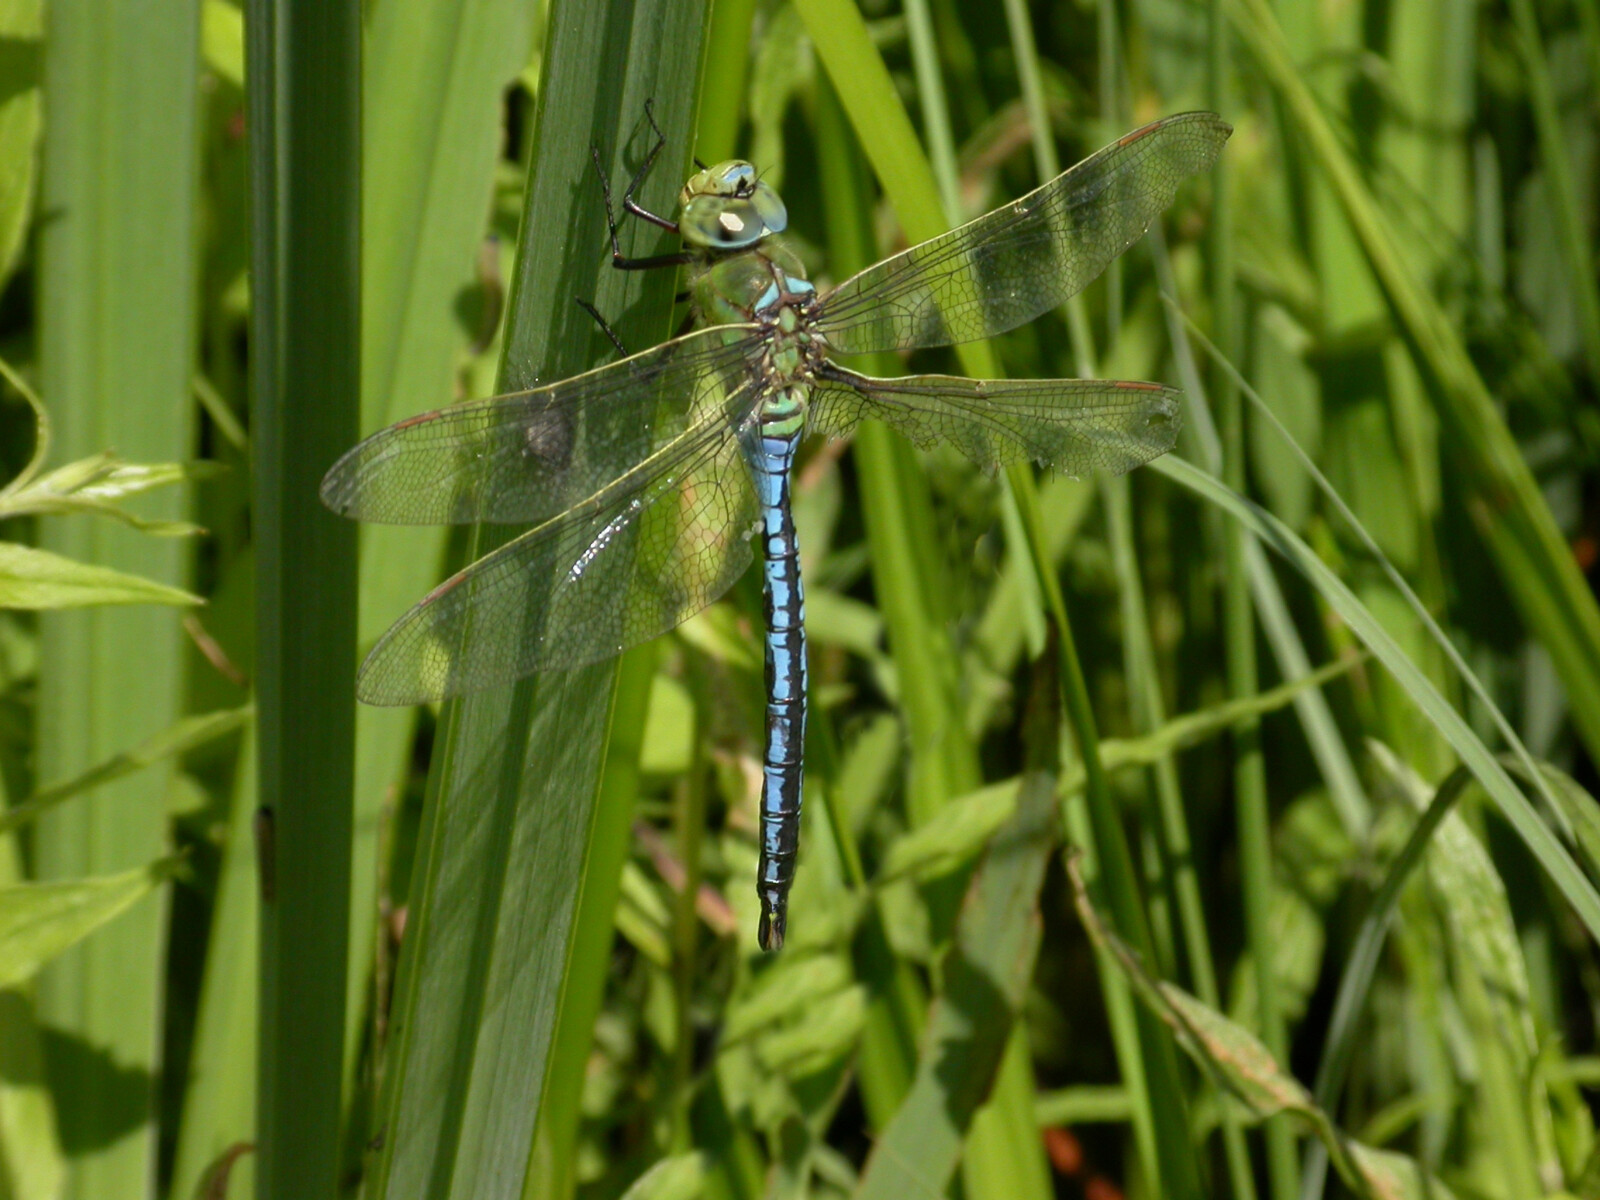 Emperor Dragonfly - credit David Kitching